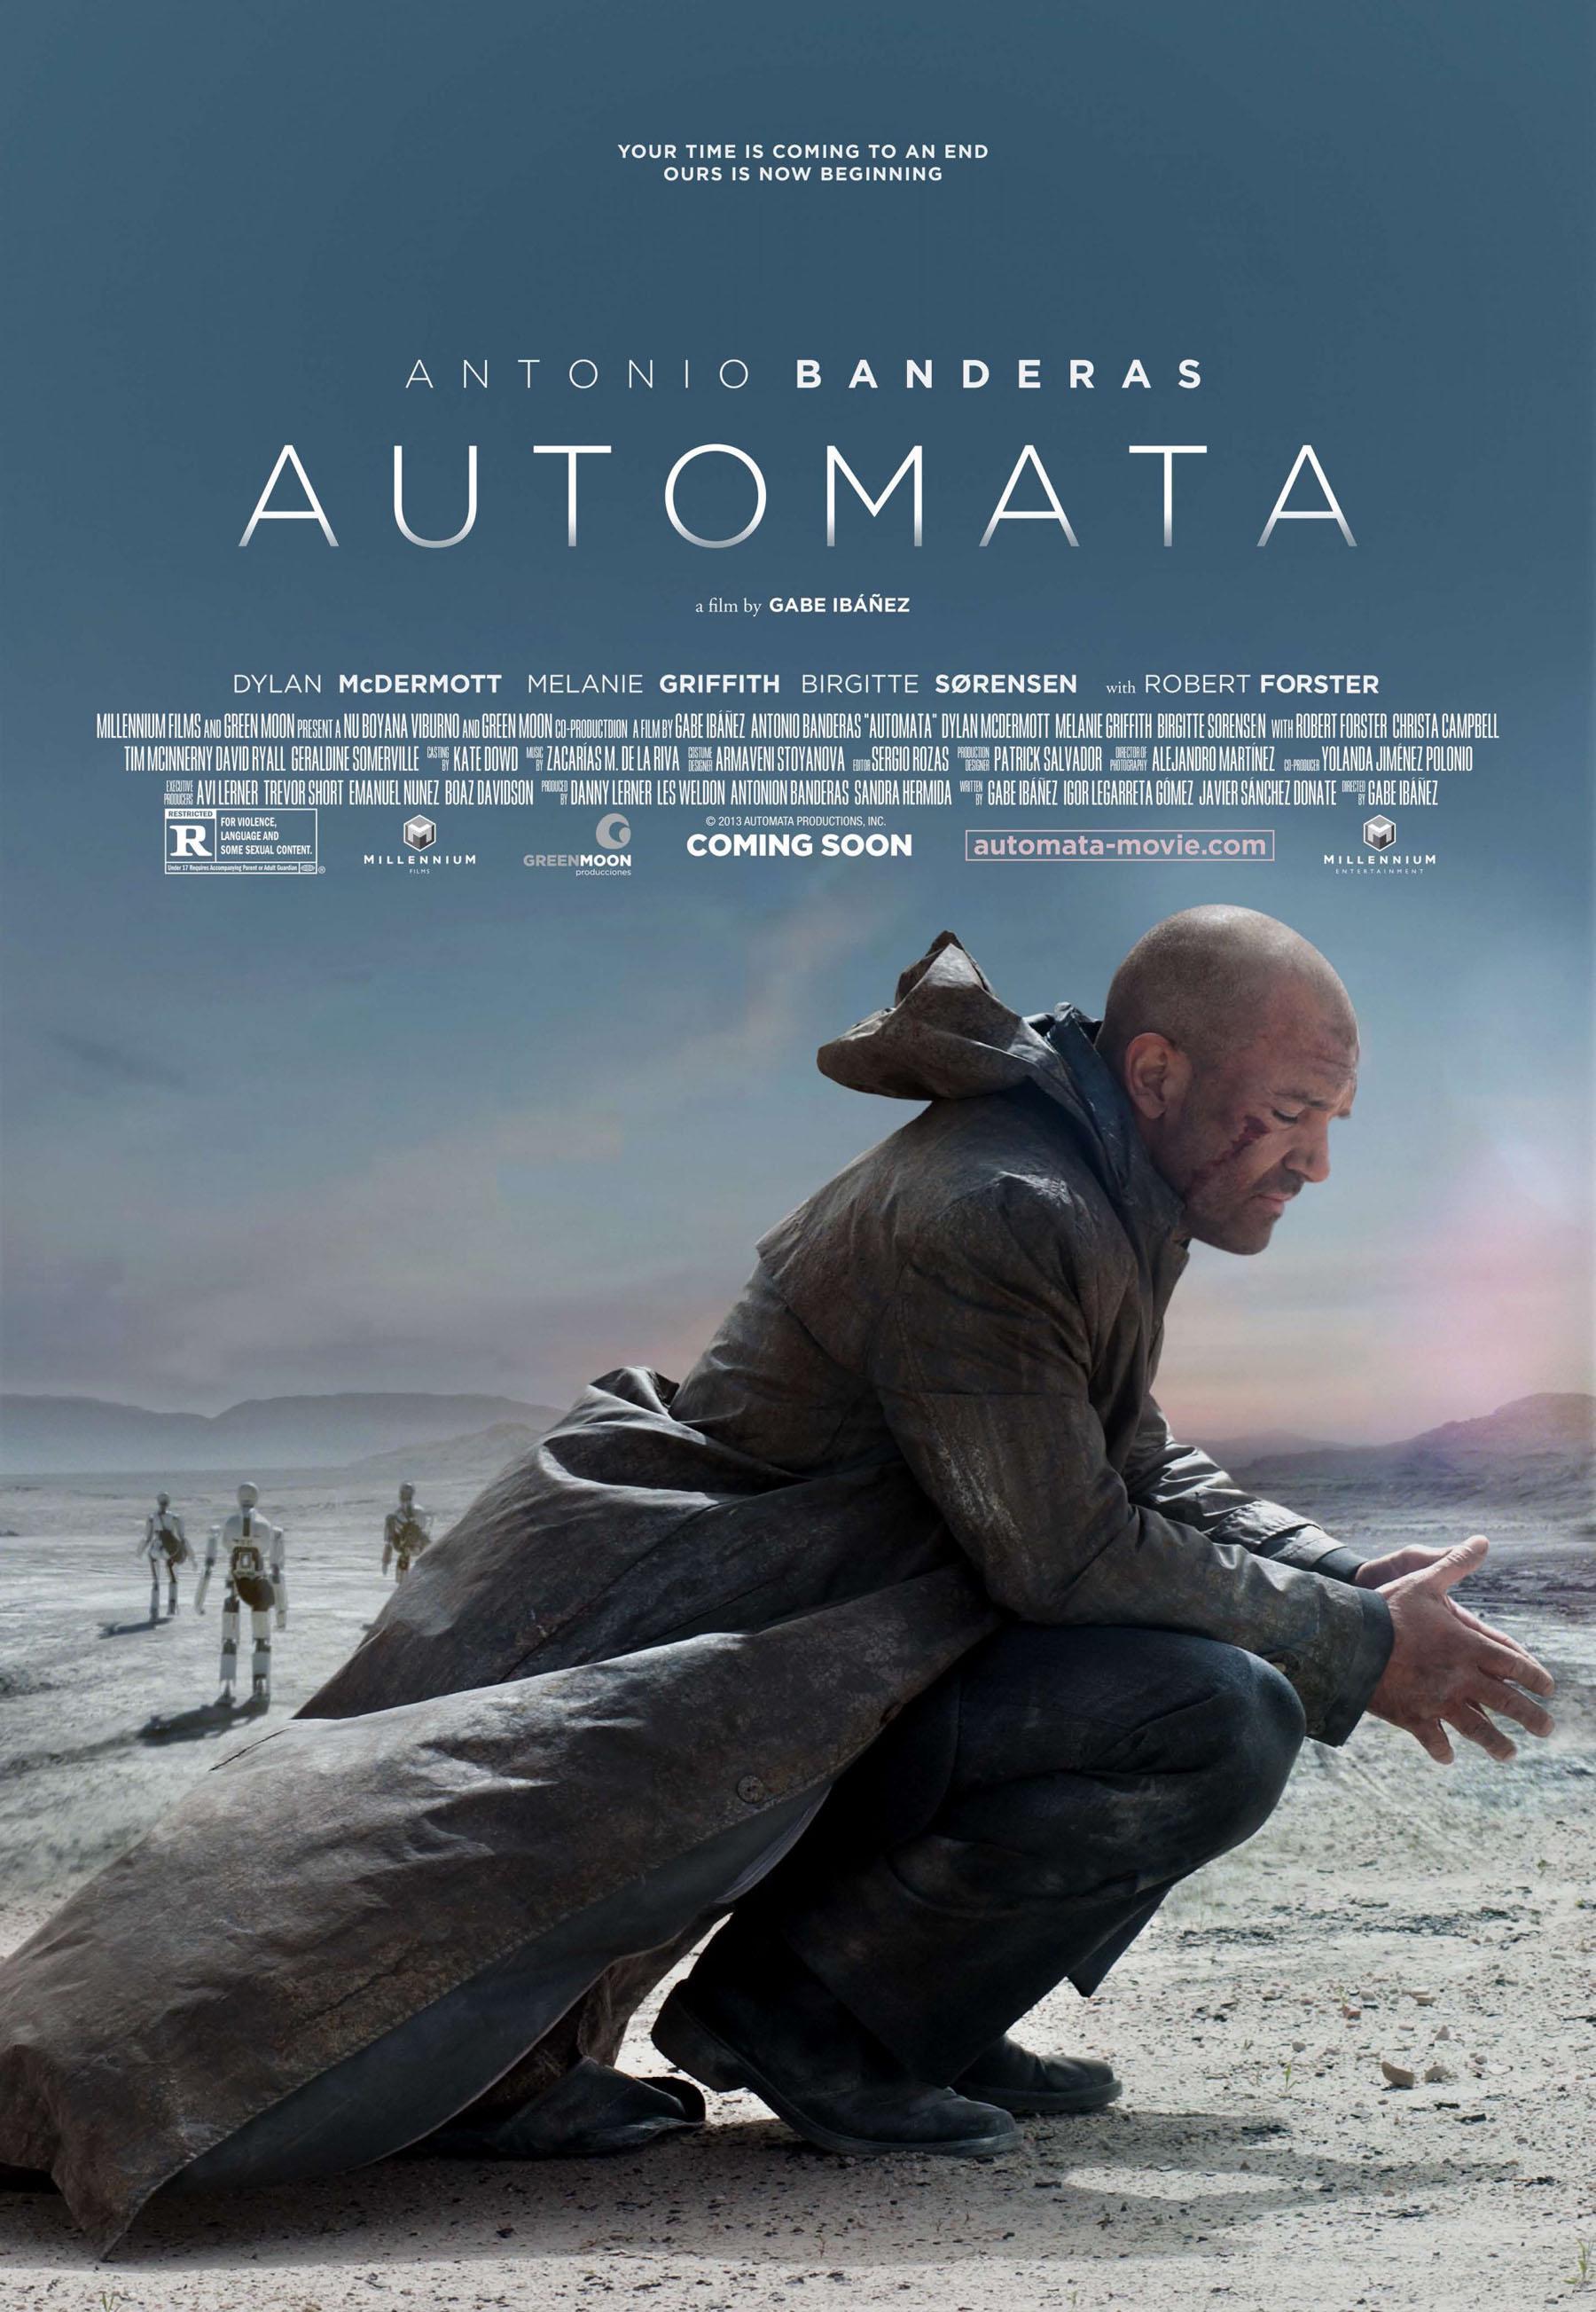 Automata Movie Review English